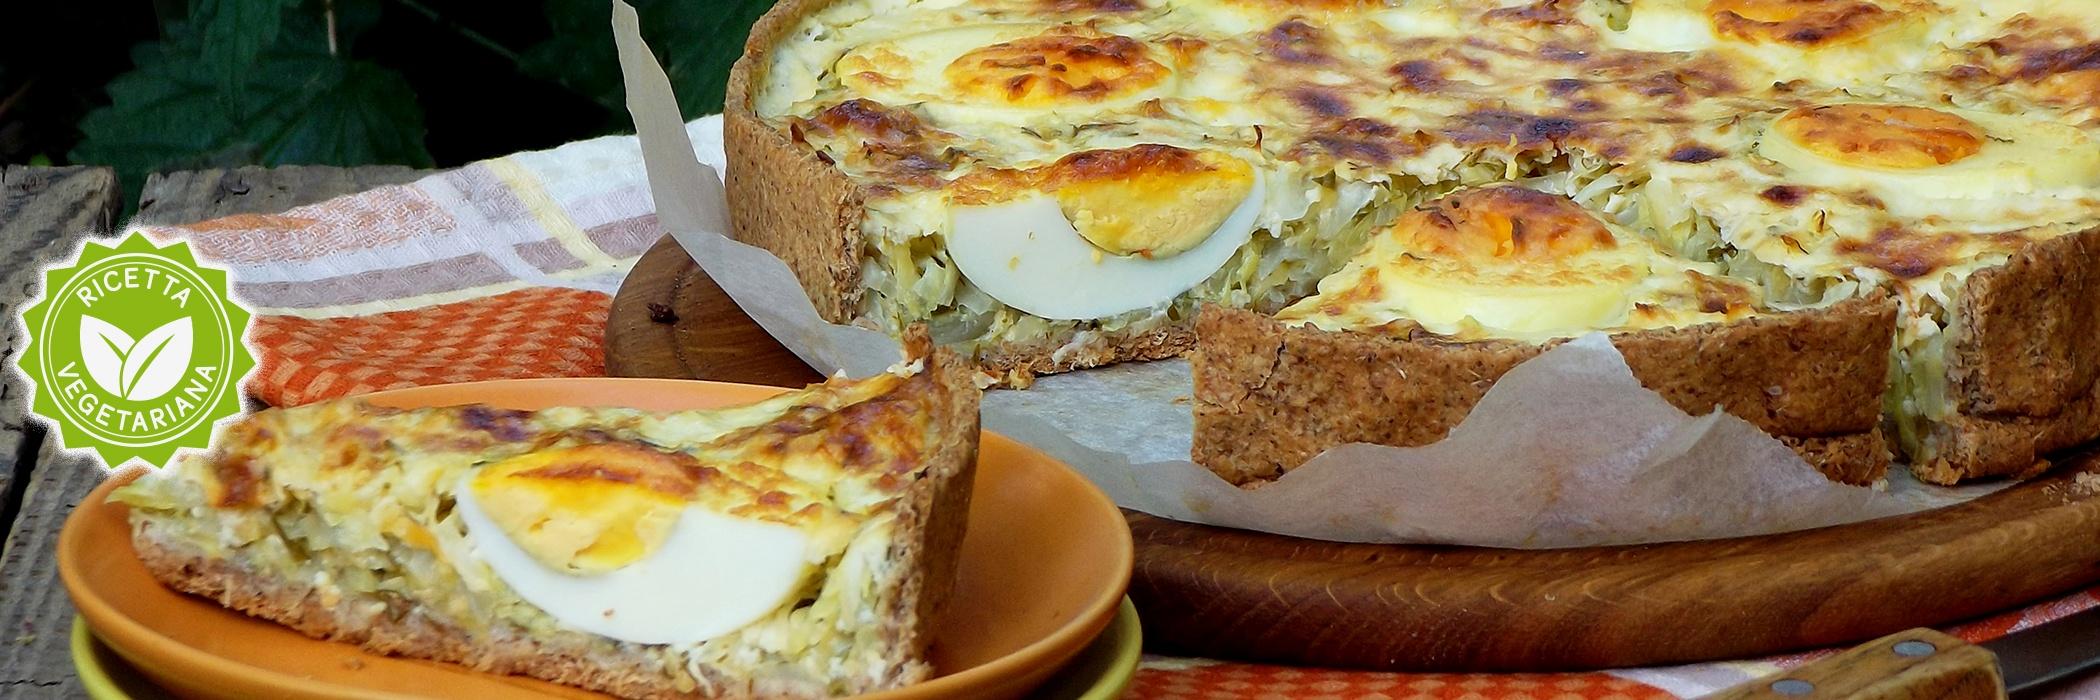 Torta salata con uova sode